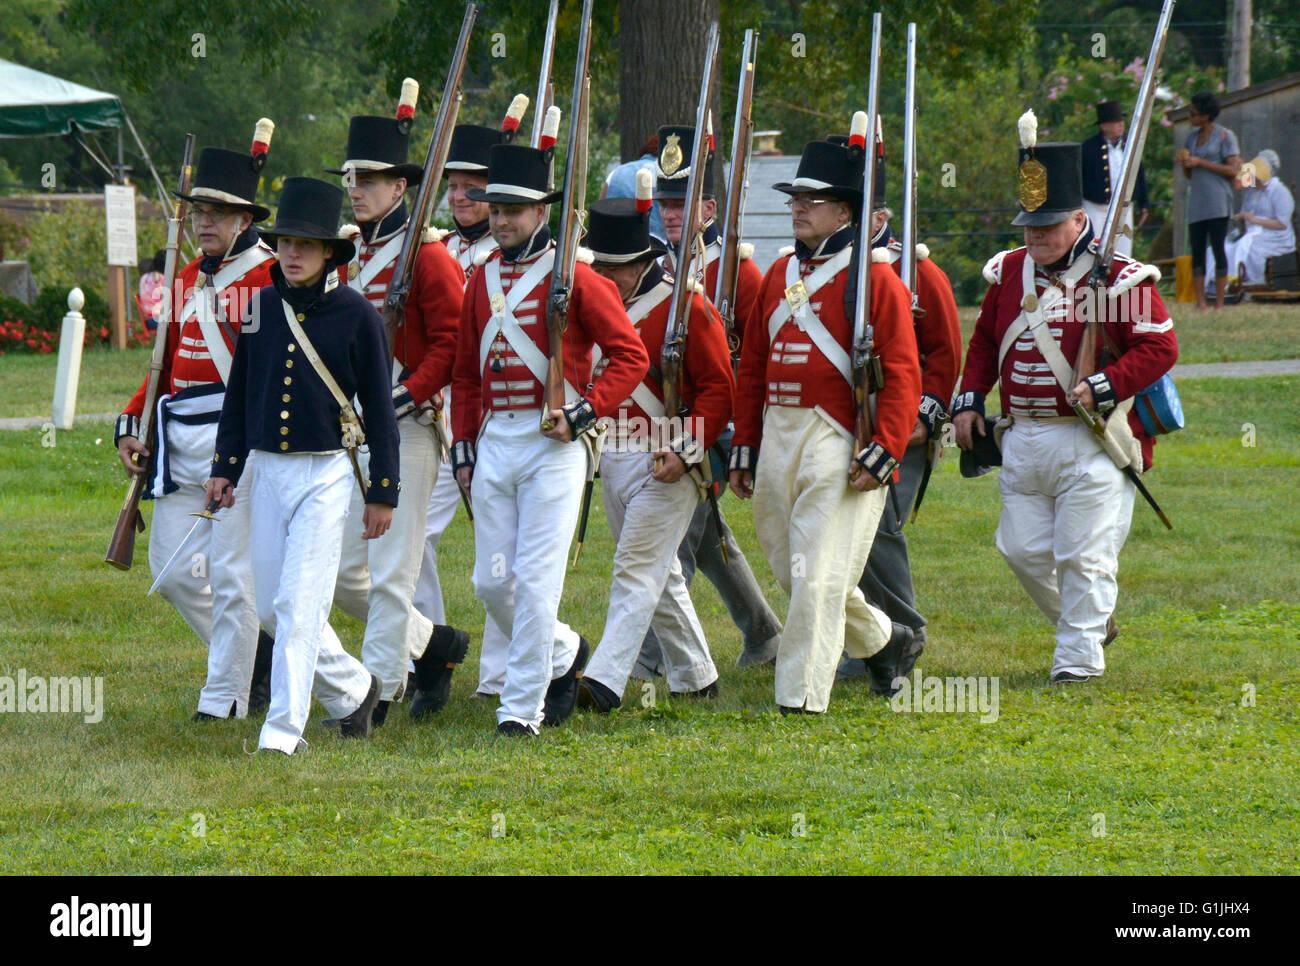 British soldiers in Battle of Bladensburgt reenactment - Stock Image